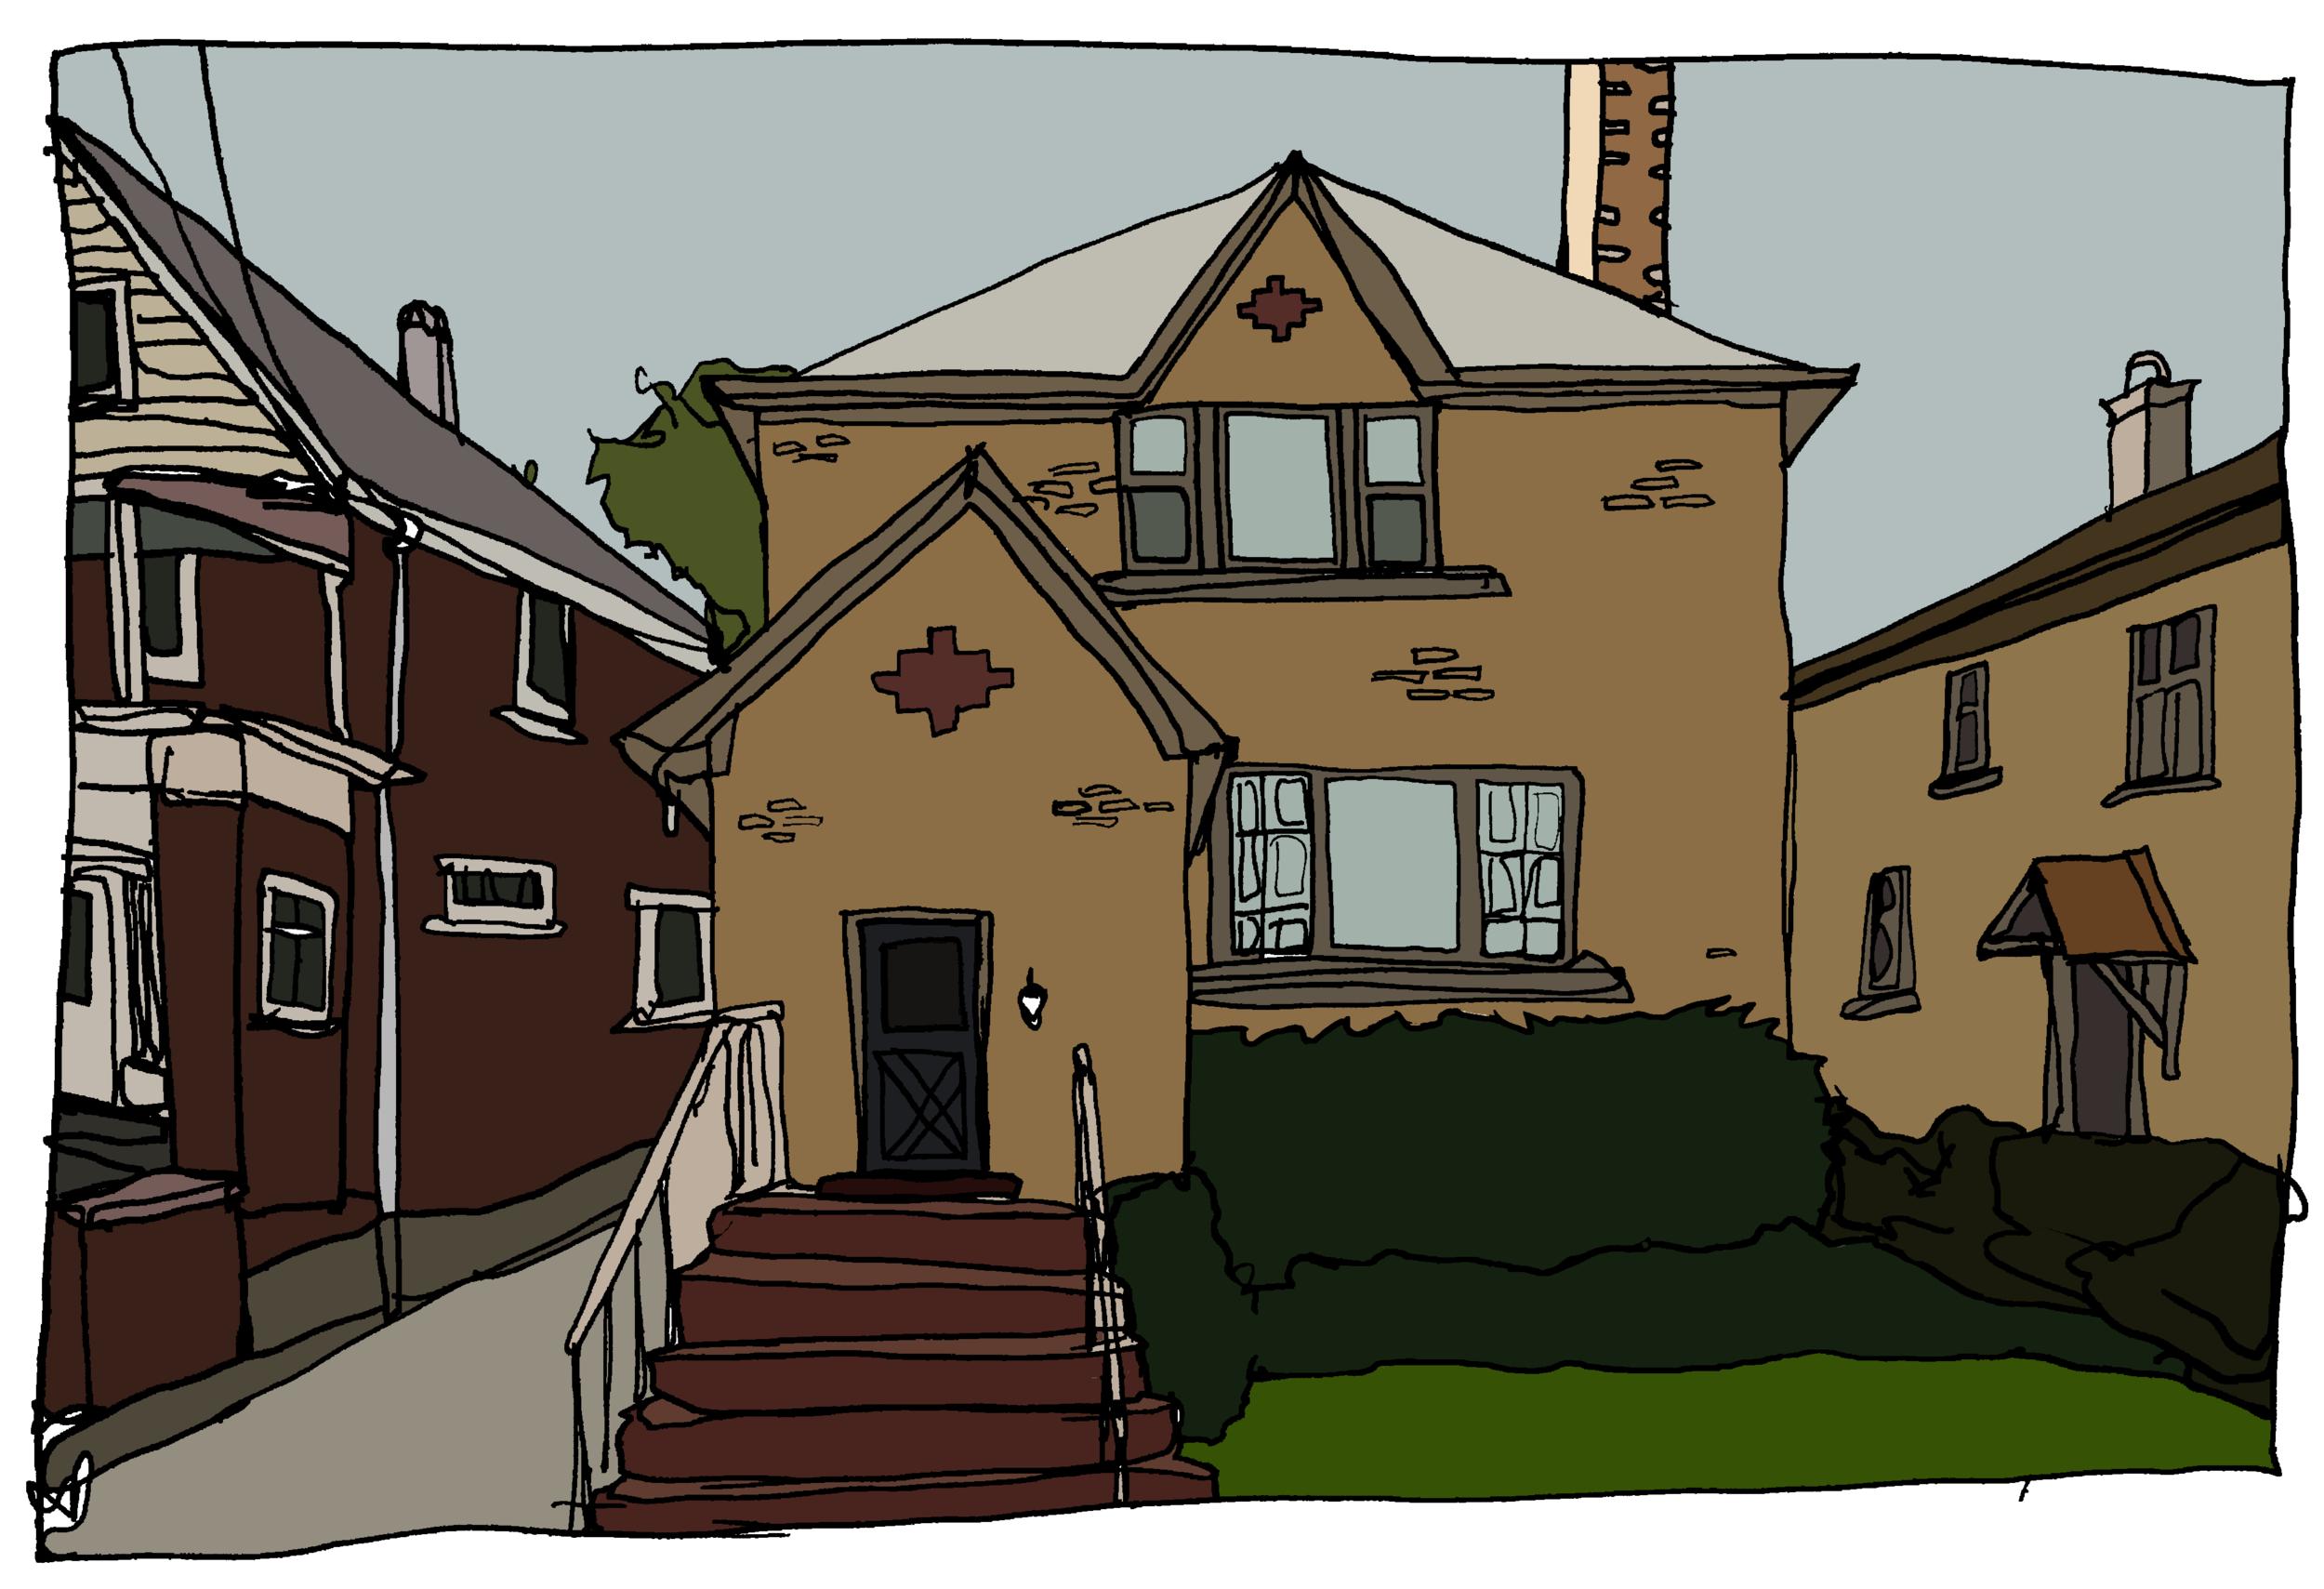 Arcangela Longo's House (Before Mob Explosion)